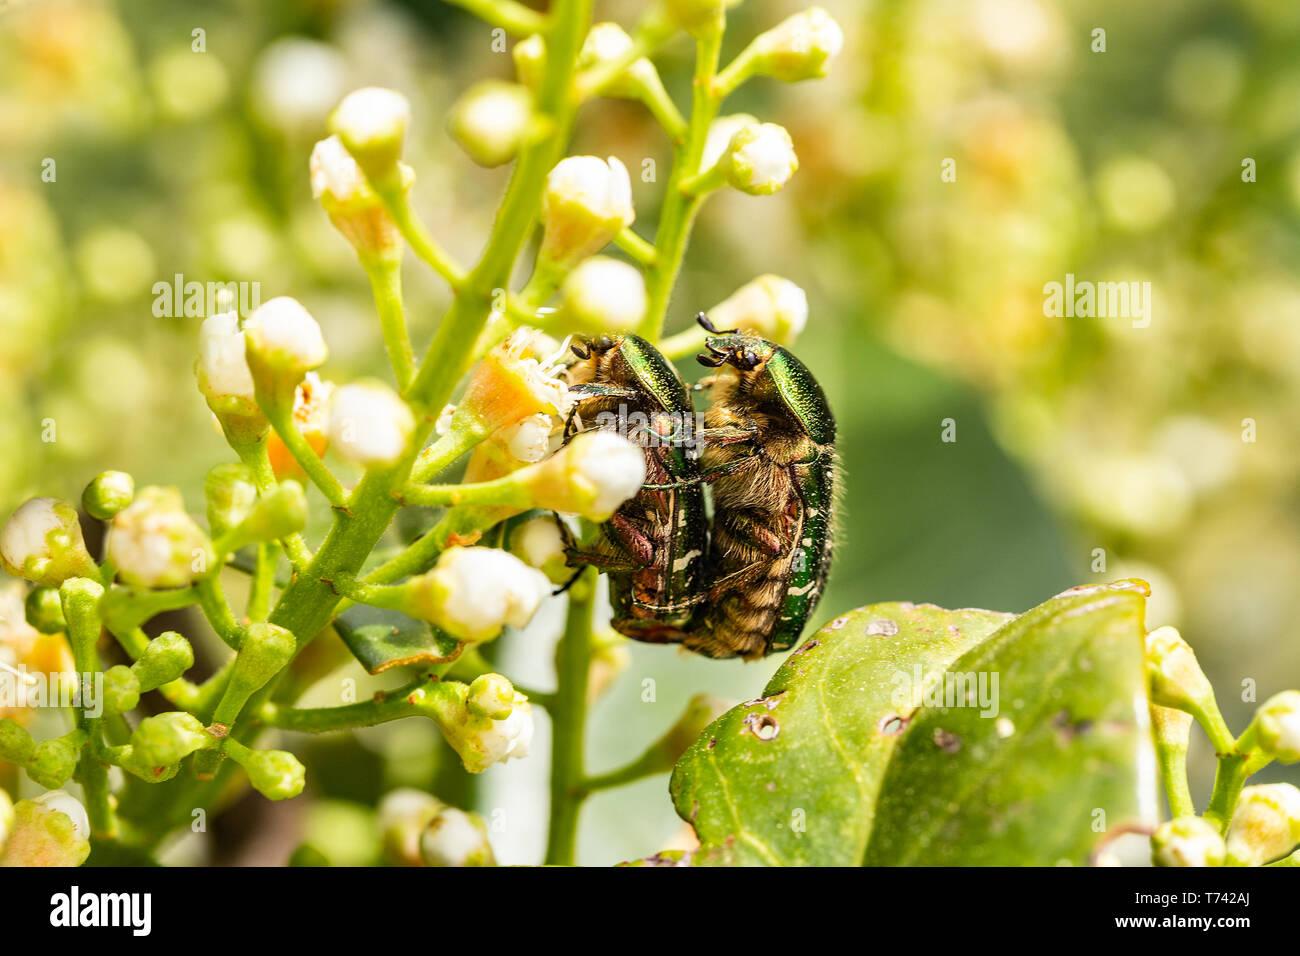 Closeup of Goldsmith beetle - Cetonia aurata - having sex during mating season Stock Photo